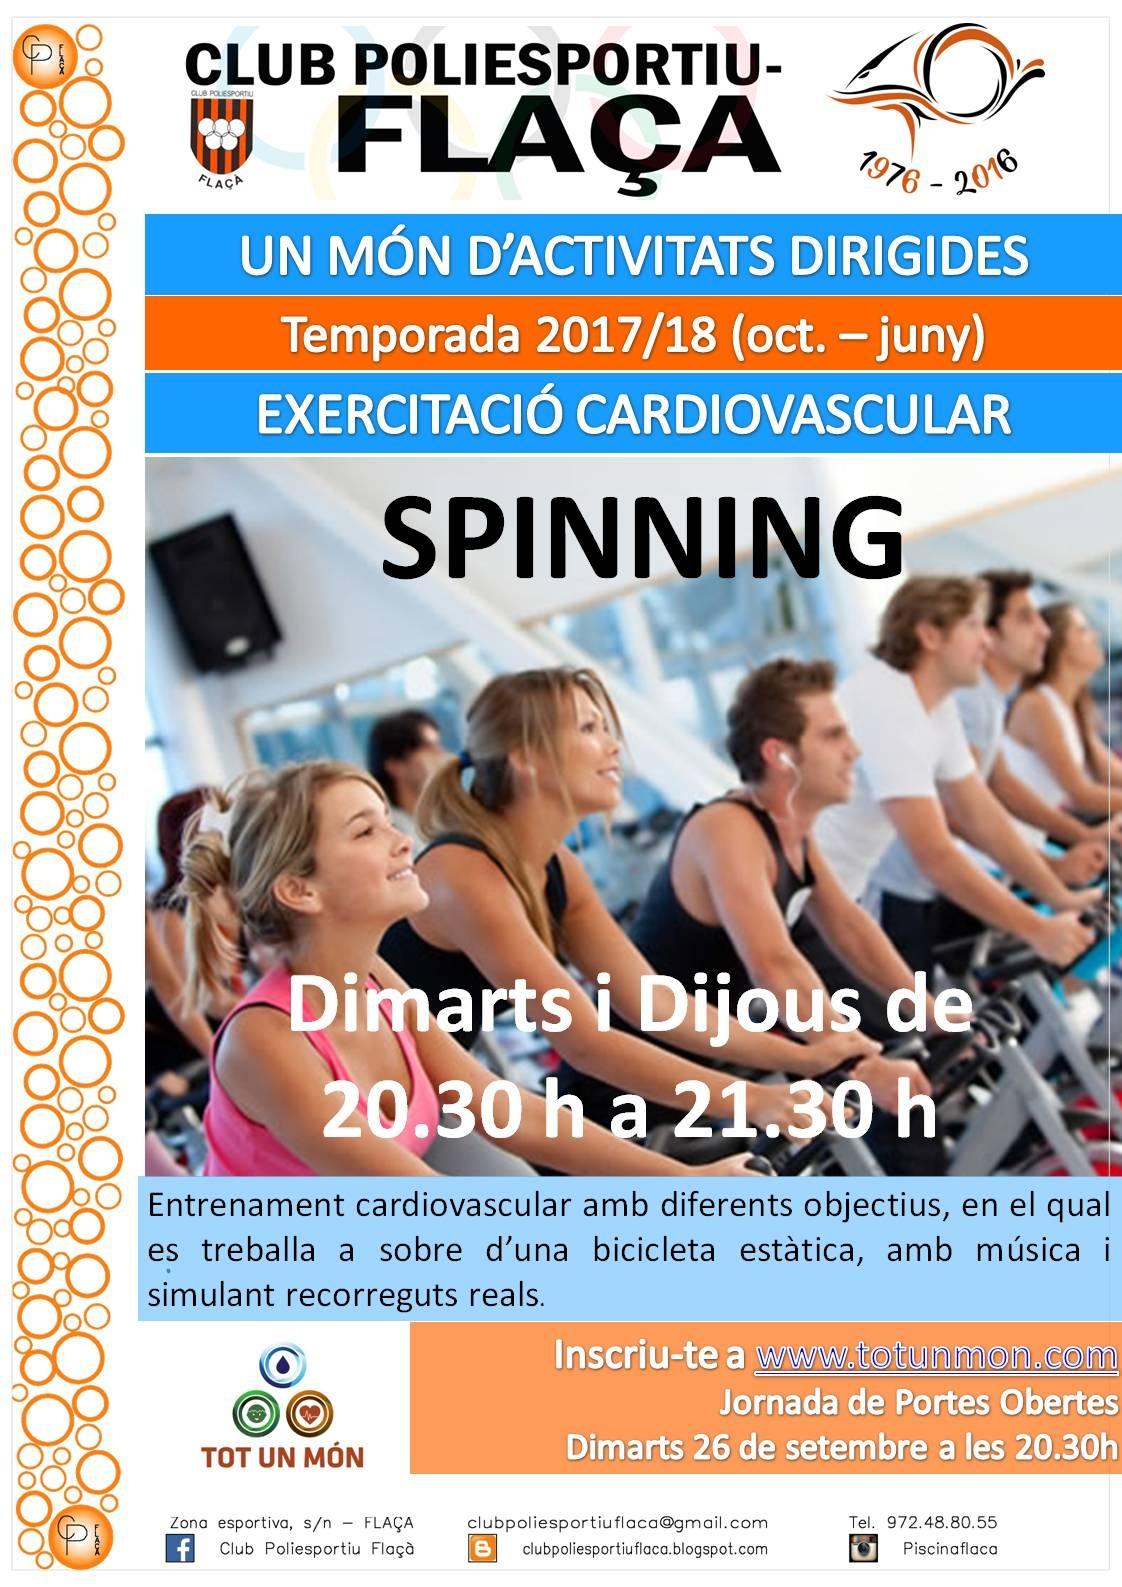 Spinning!